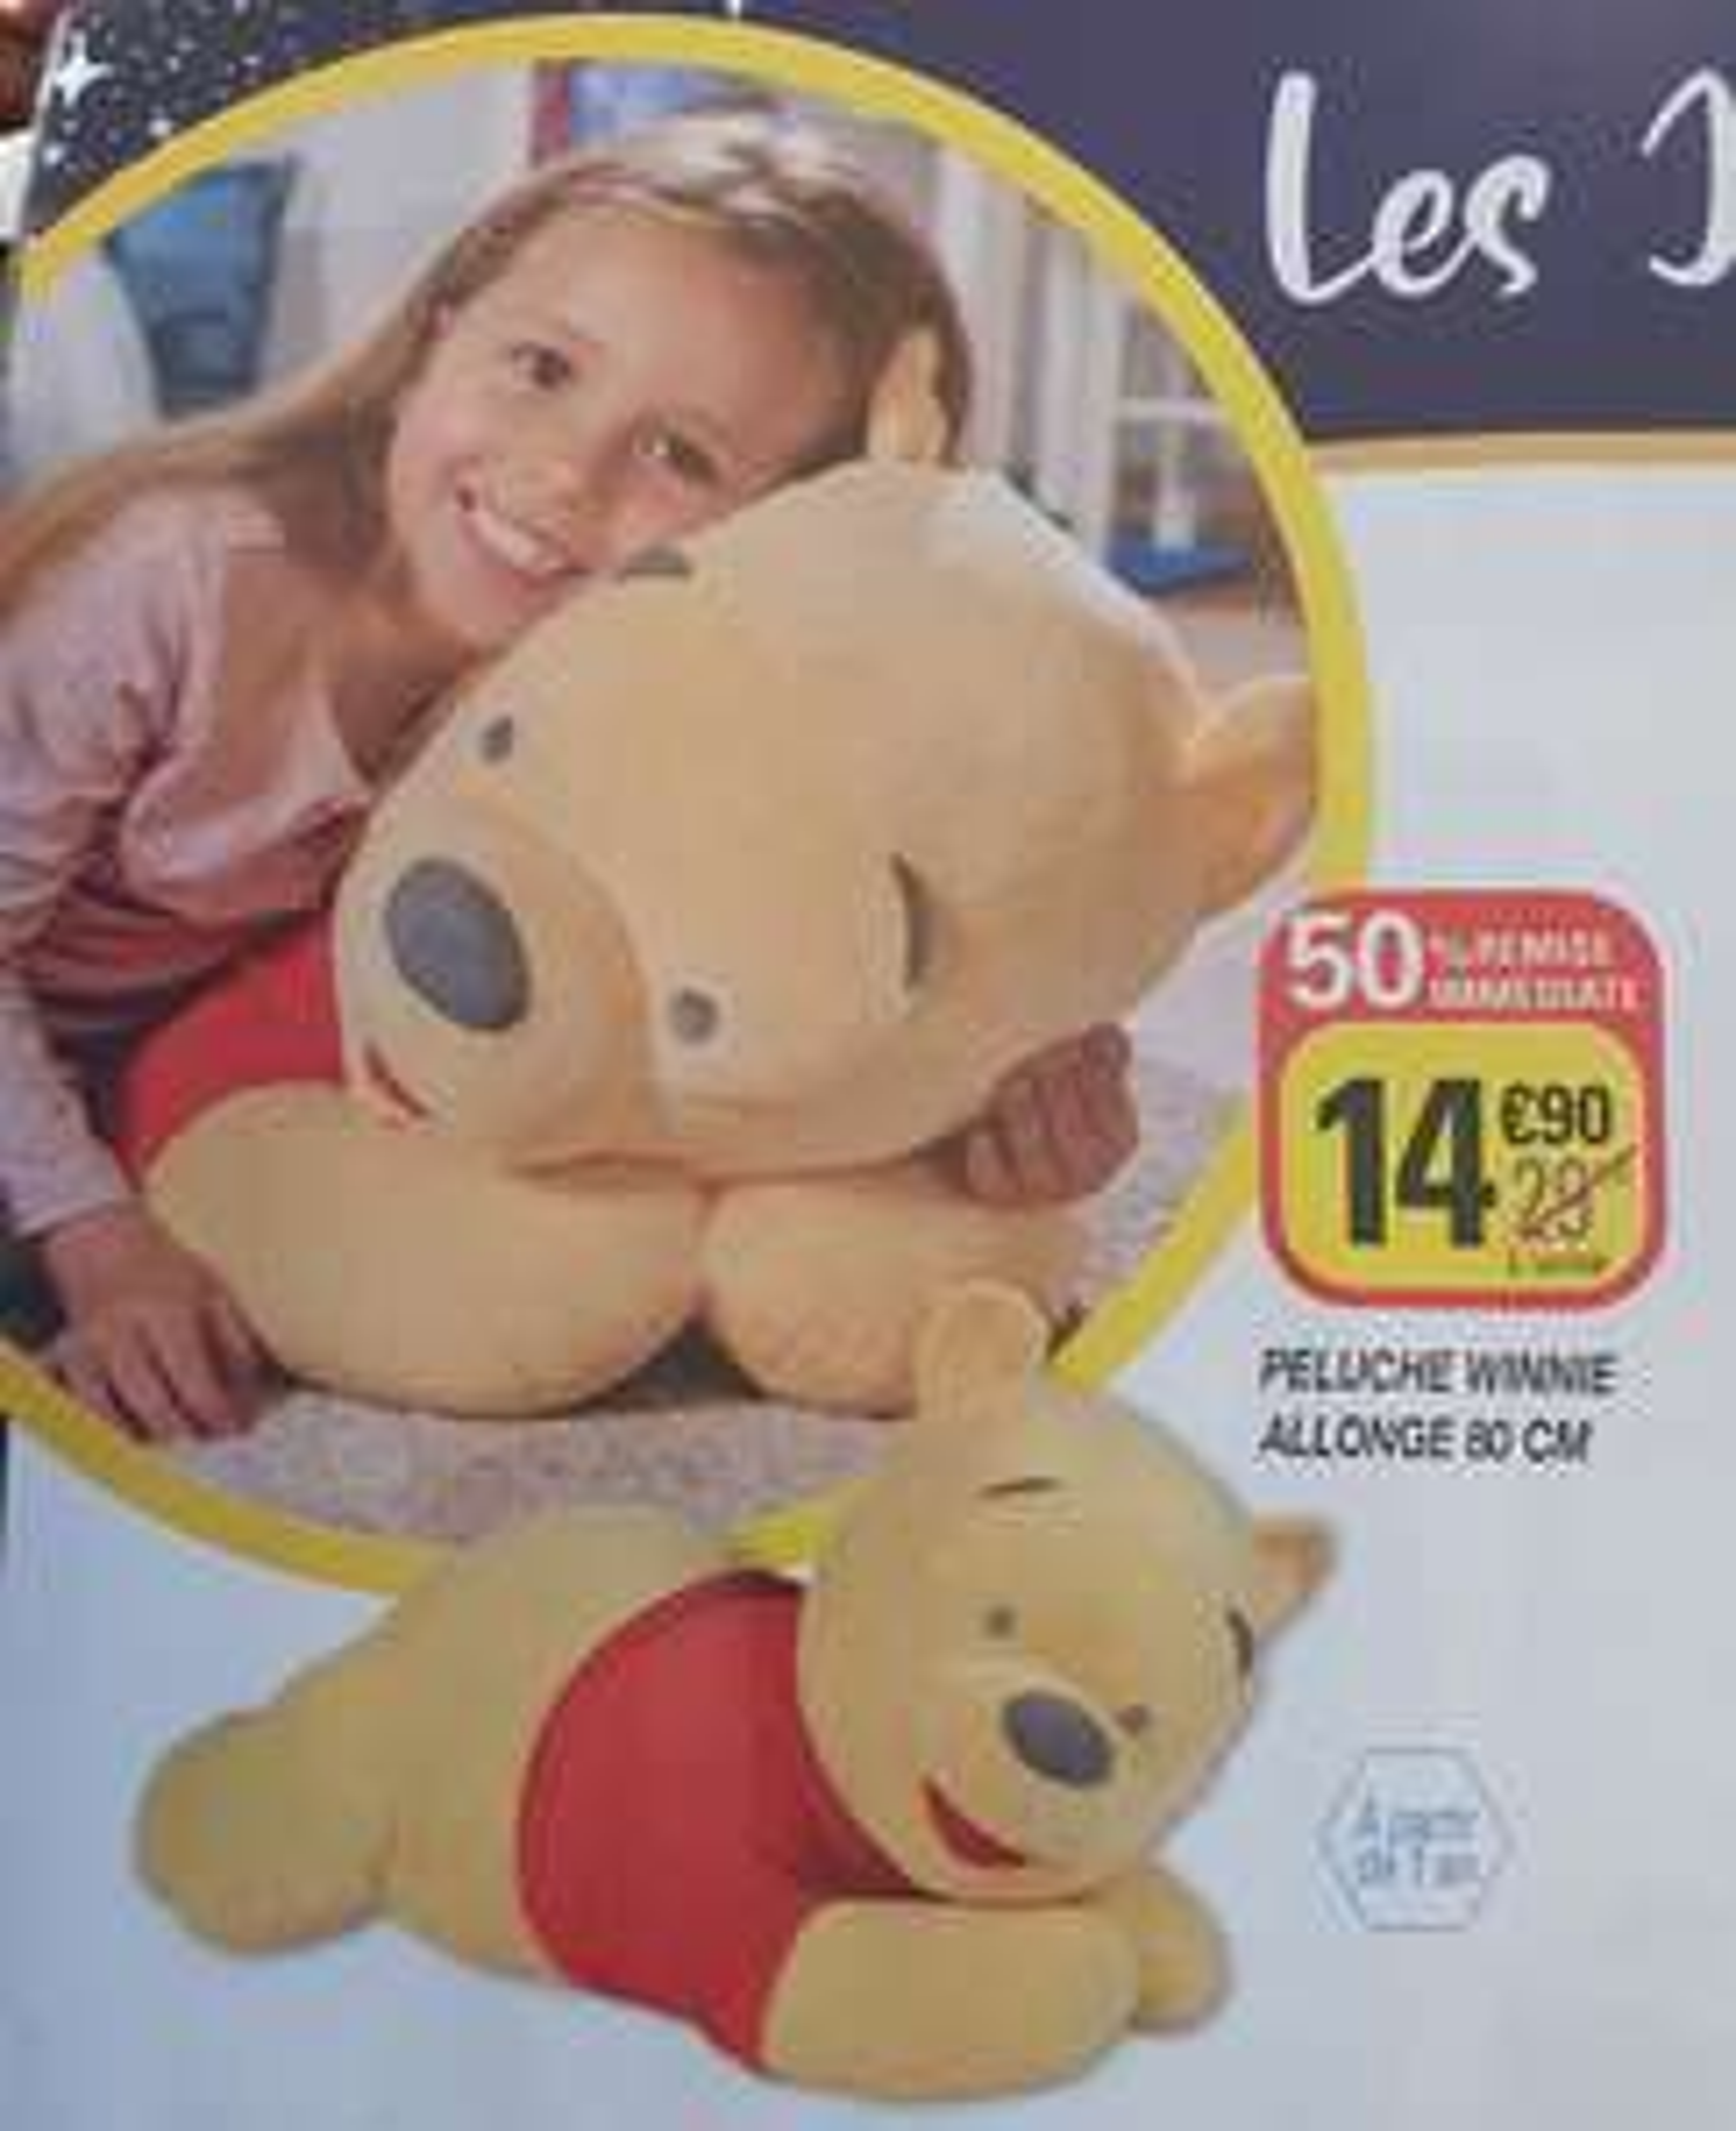 Peluche Winnie allongé - 80 cm